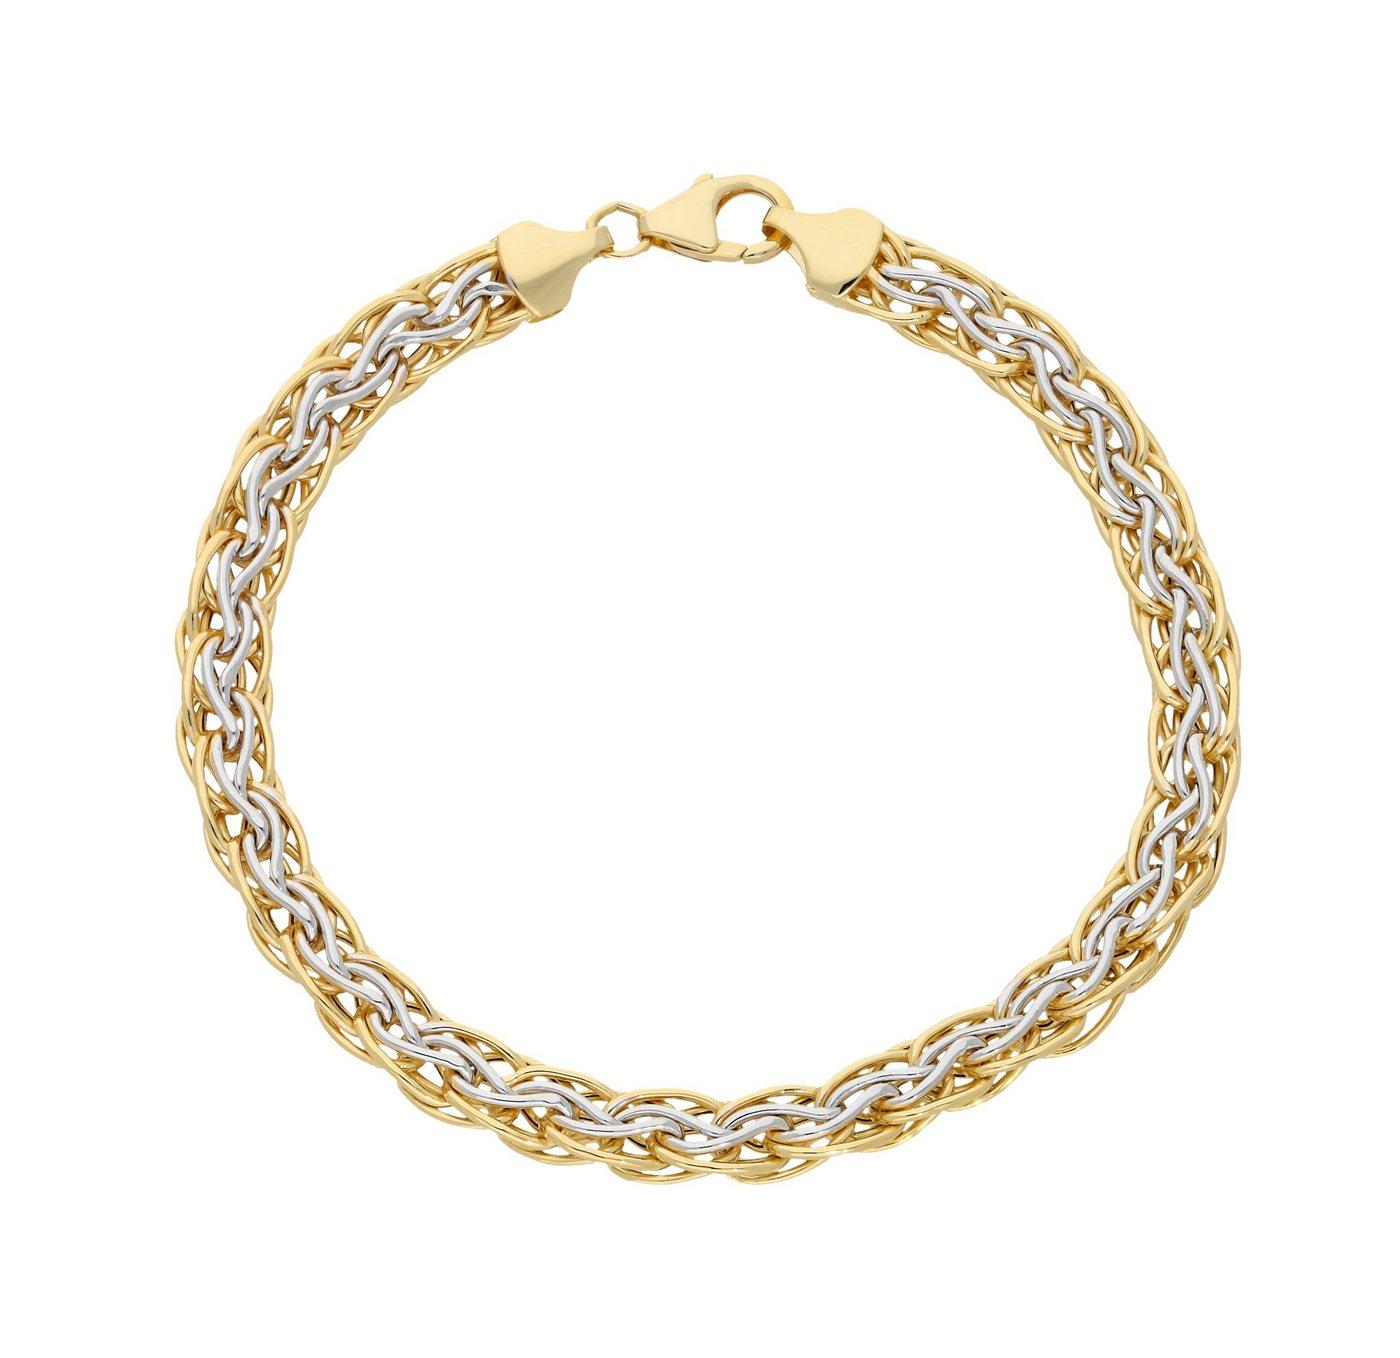 Firetti Goldarmband »Bicolor« rhodiniert | Schmuck > Armbänder > Goldarmbänder | Goldfarben | Firetti